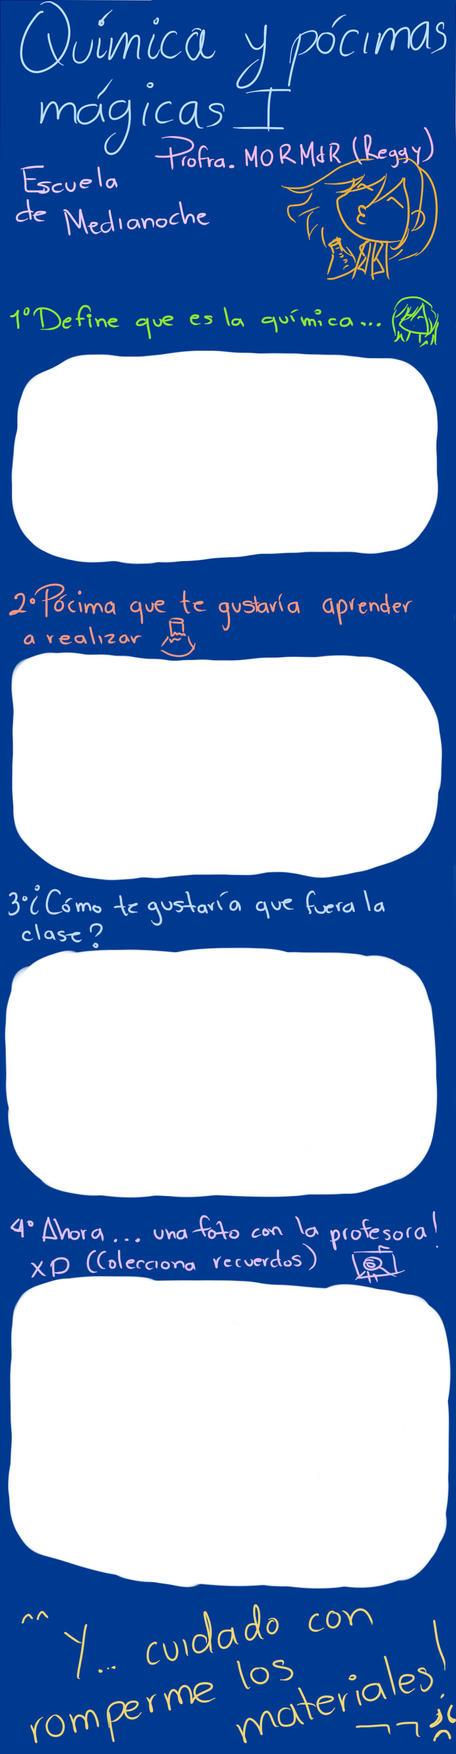 EDM Quimica 1 clase mini test by girlz-rock